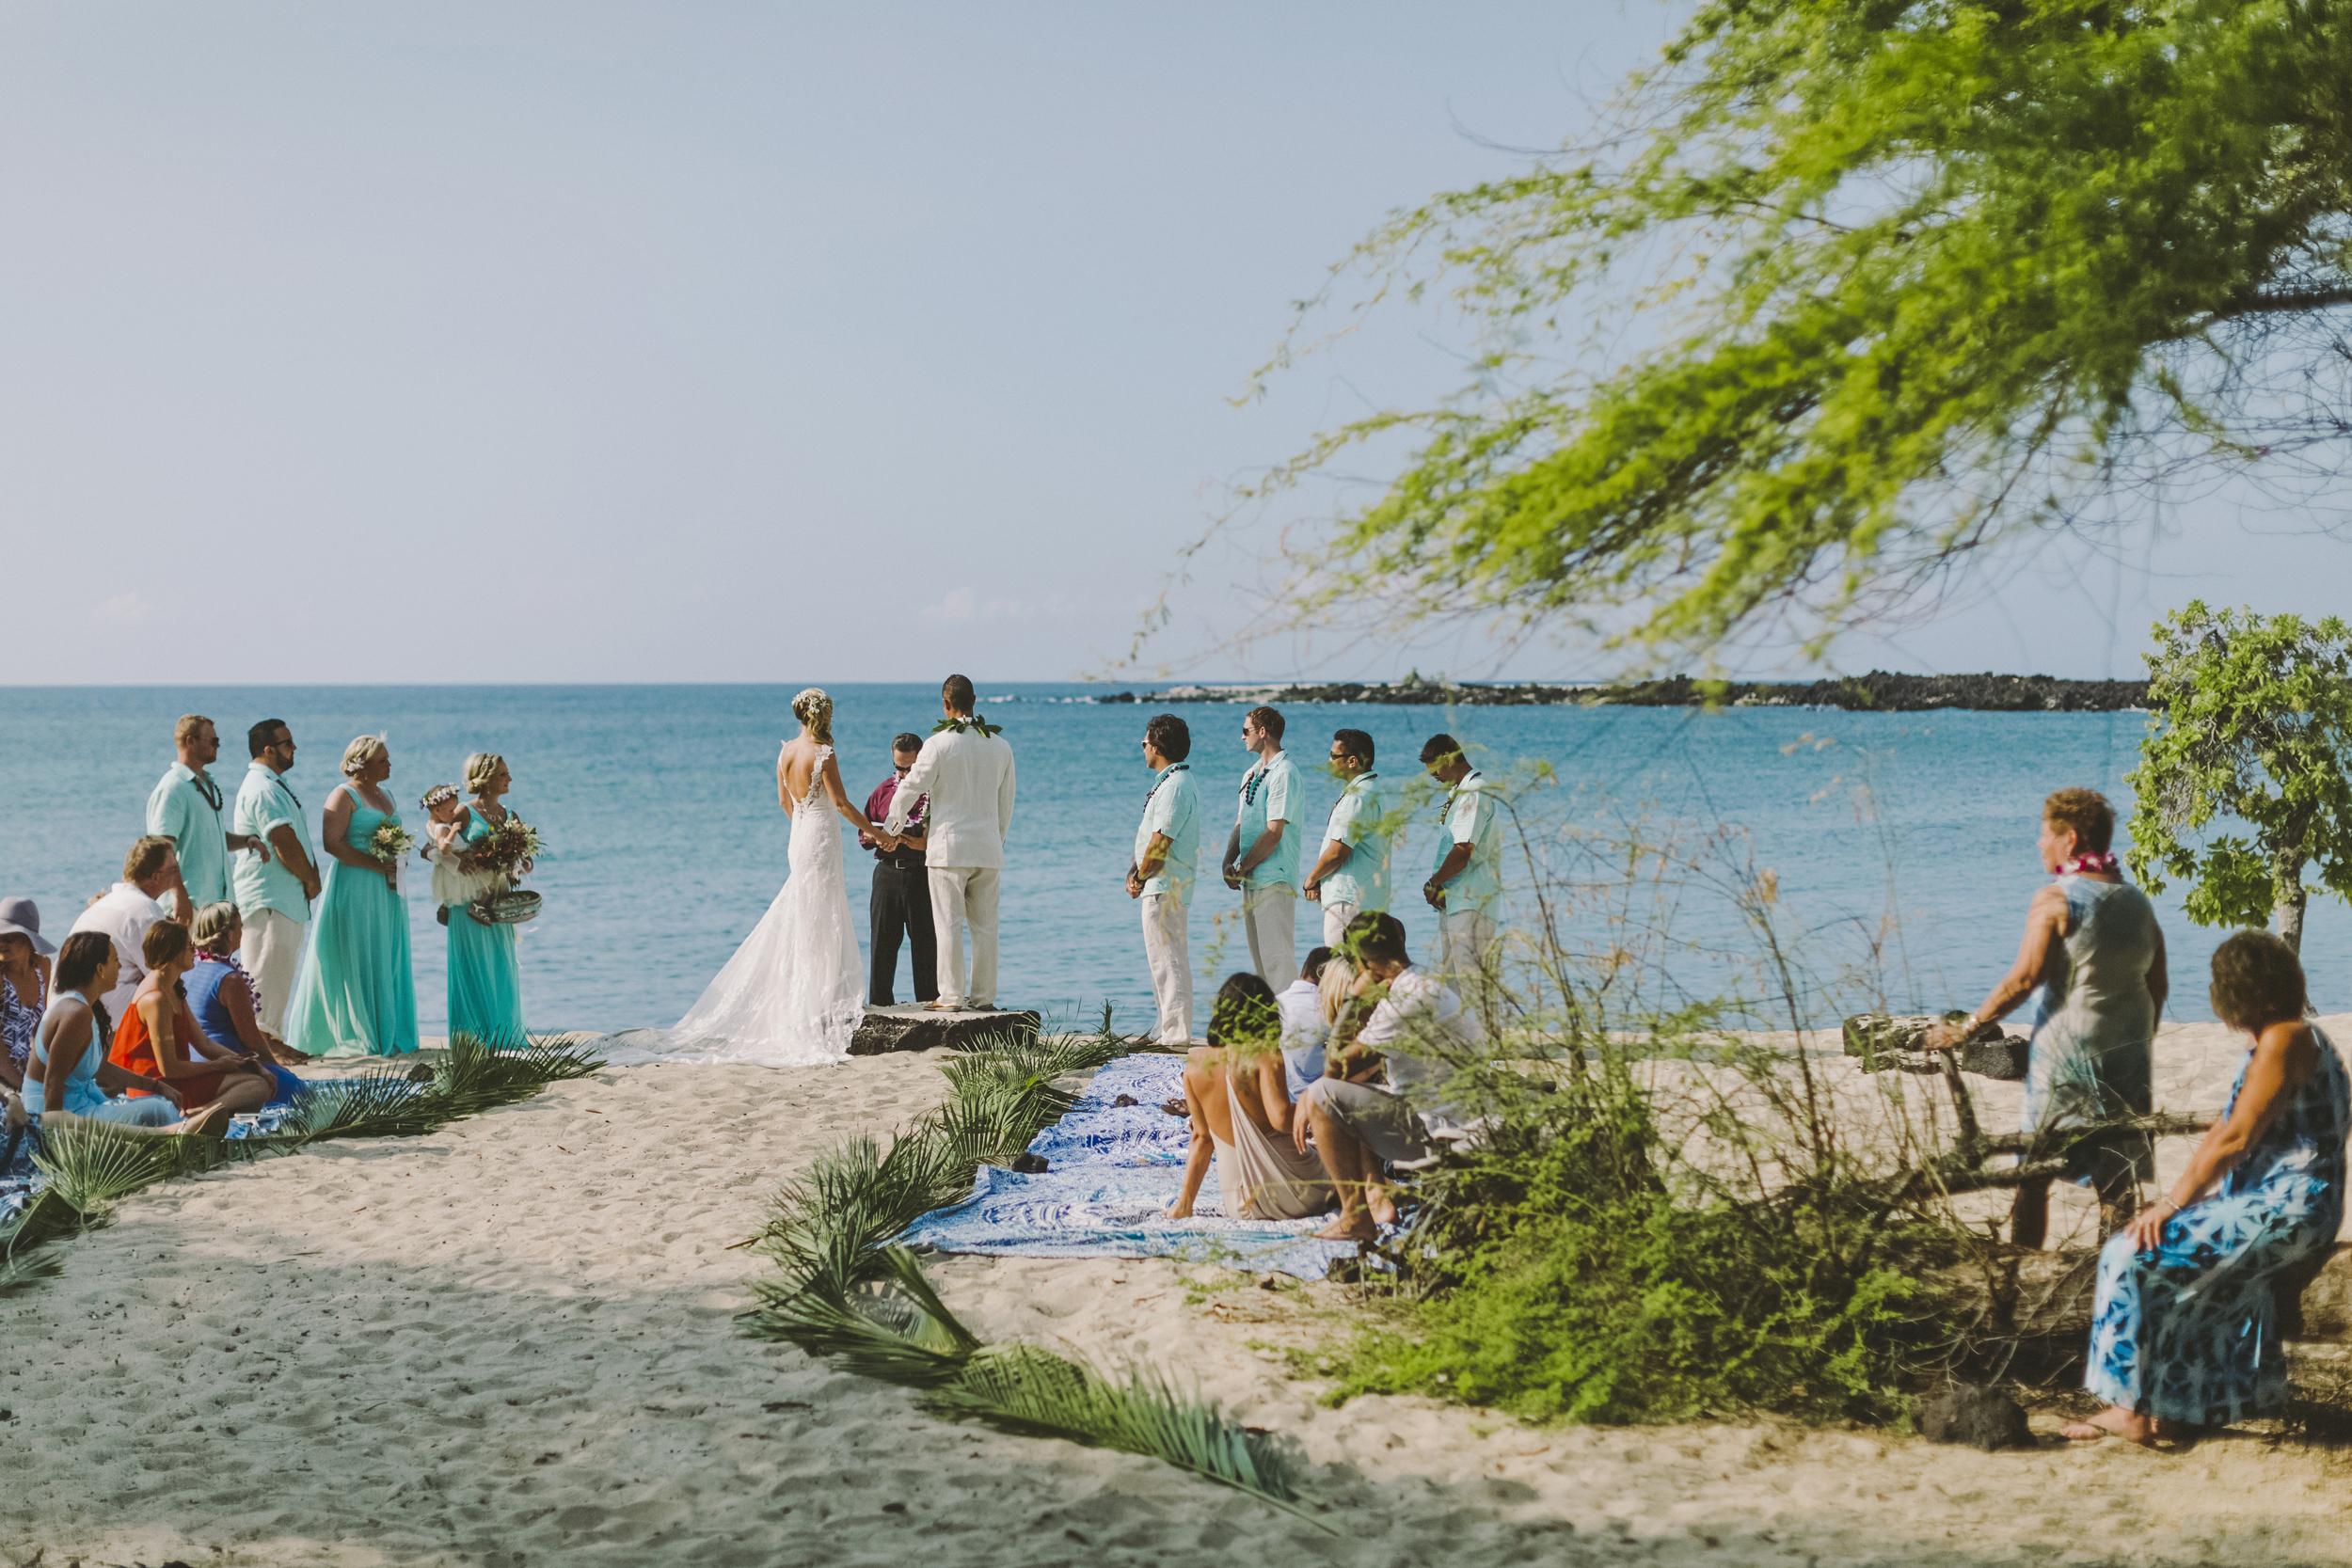 angie-diaz-photography-hawaii-wedding-photographer-kelli-jay-69.jpg